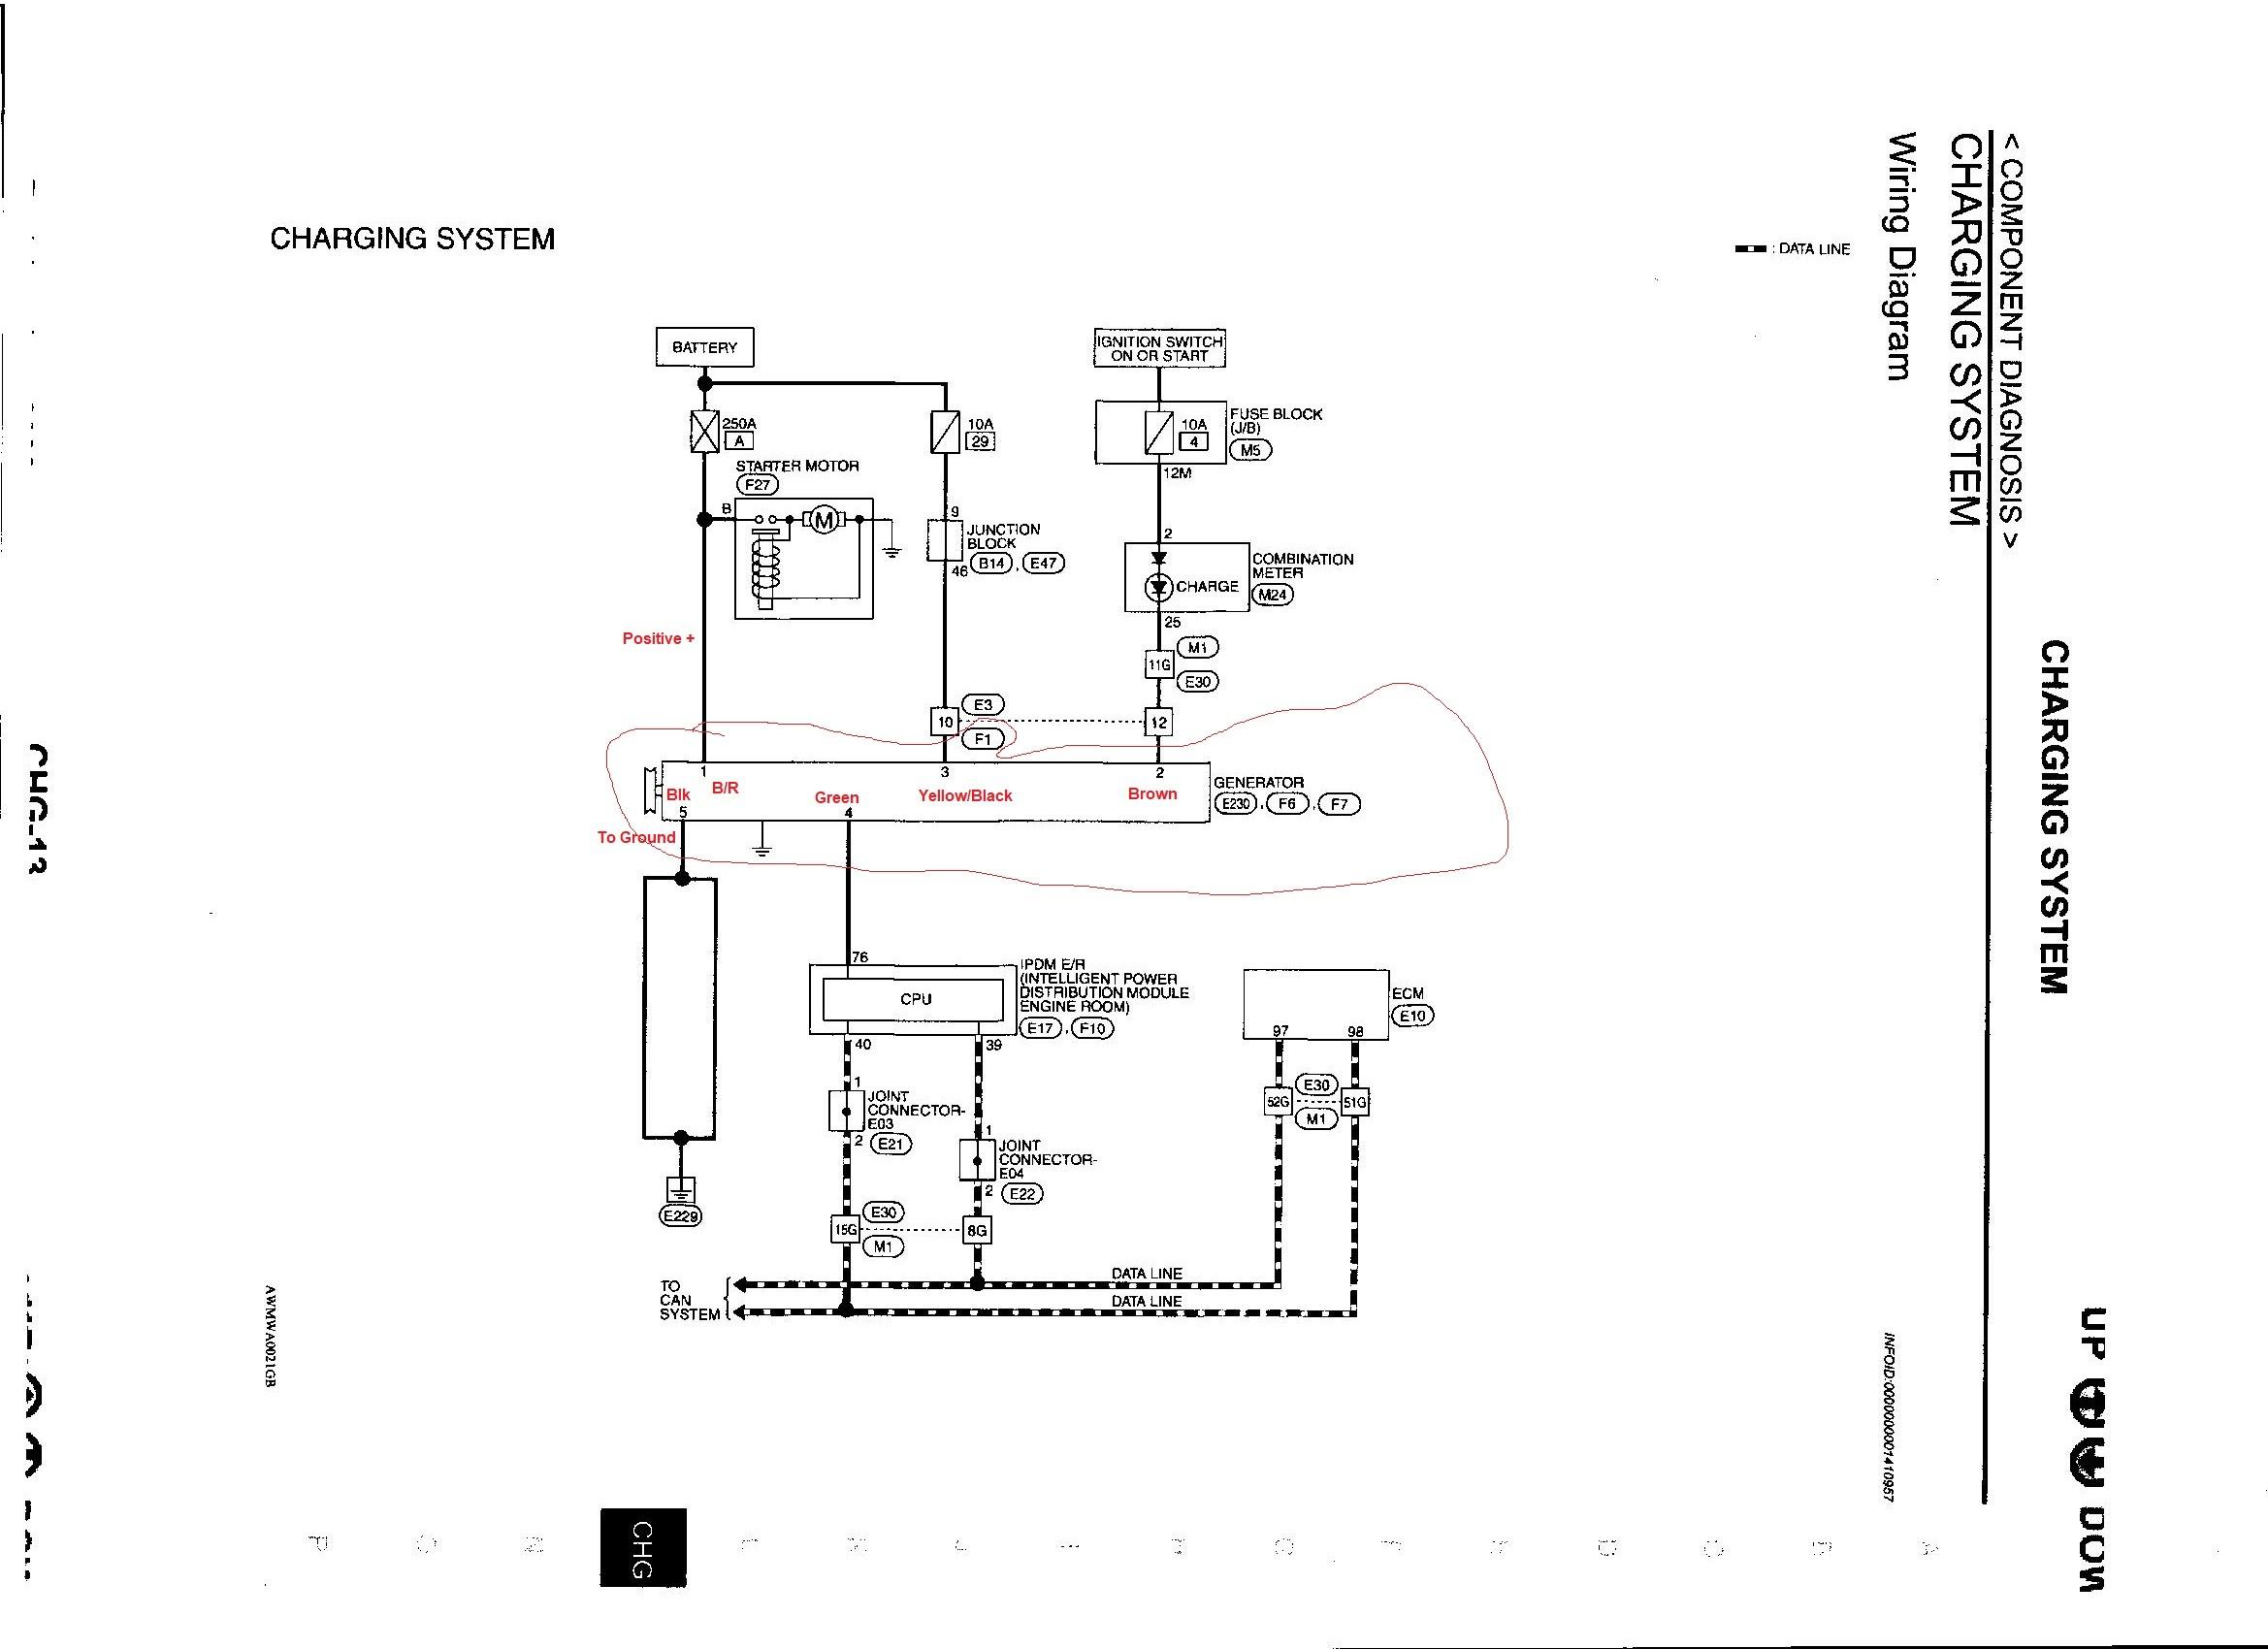 Wiring Diagram for 2008 Nissan Altima Duraman Pig Tail 2008 Nissan Altima Alternator Wiring Diagram Wiring Diagram Of Wiring Diagram for 2008 Nissan Altima Duraman Pig Tail